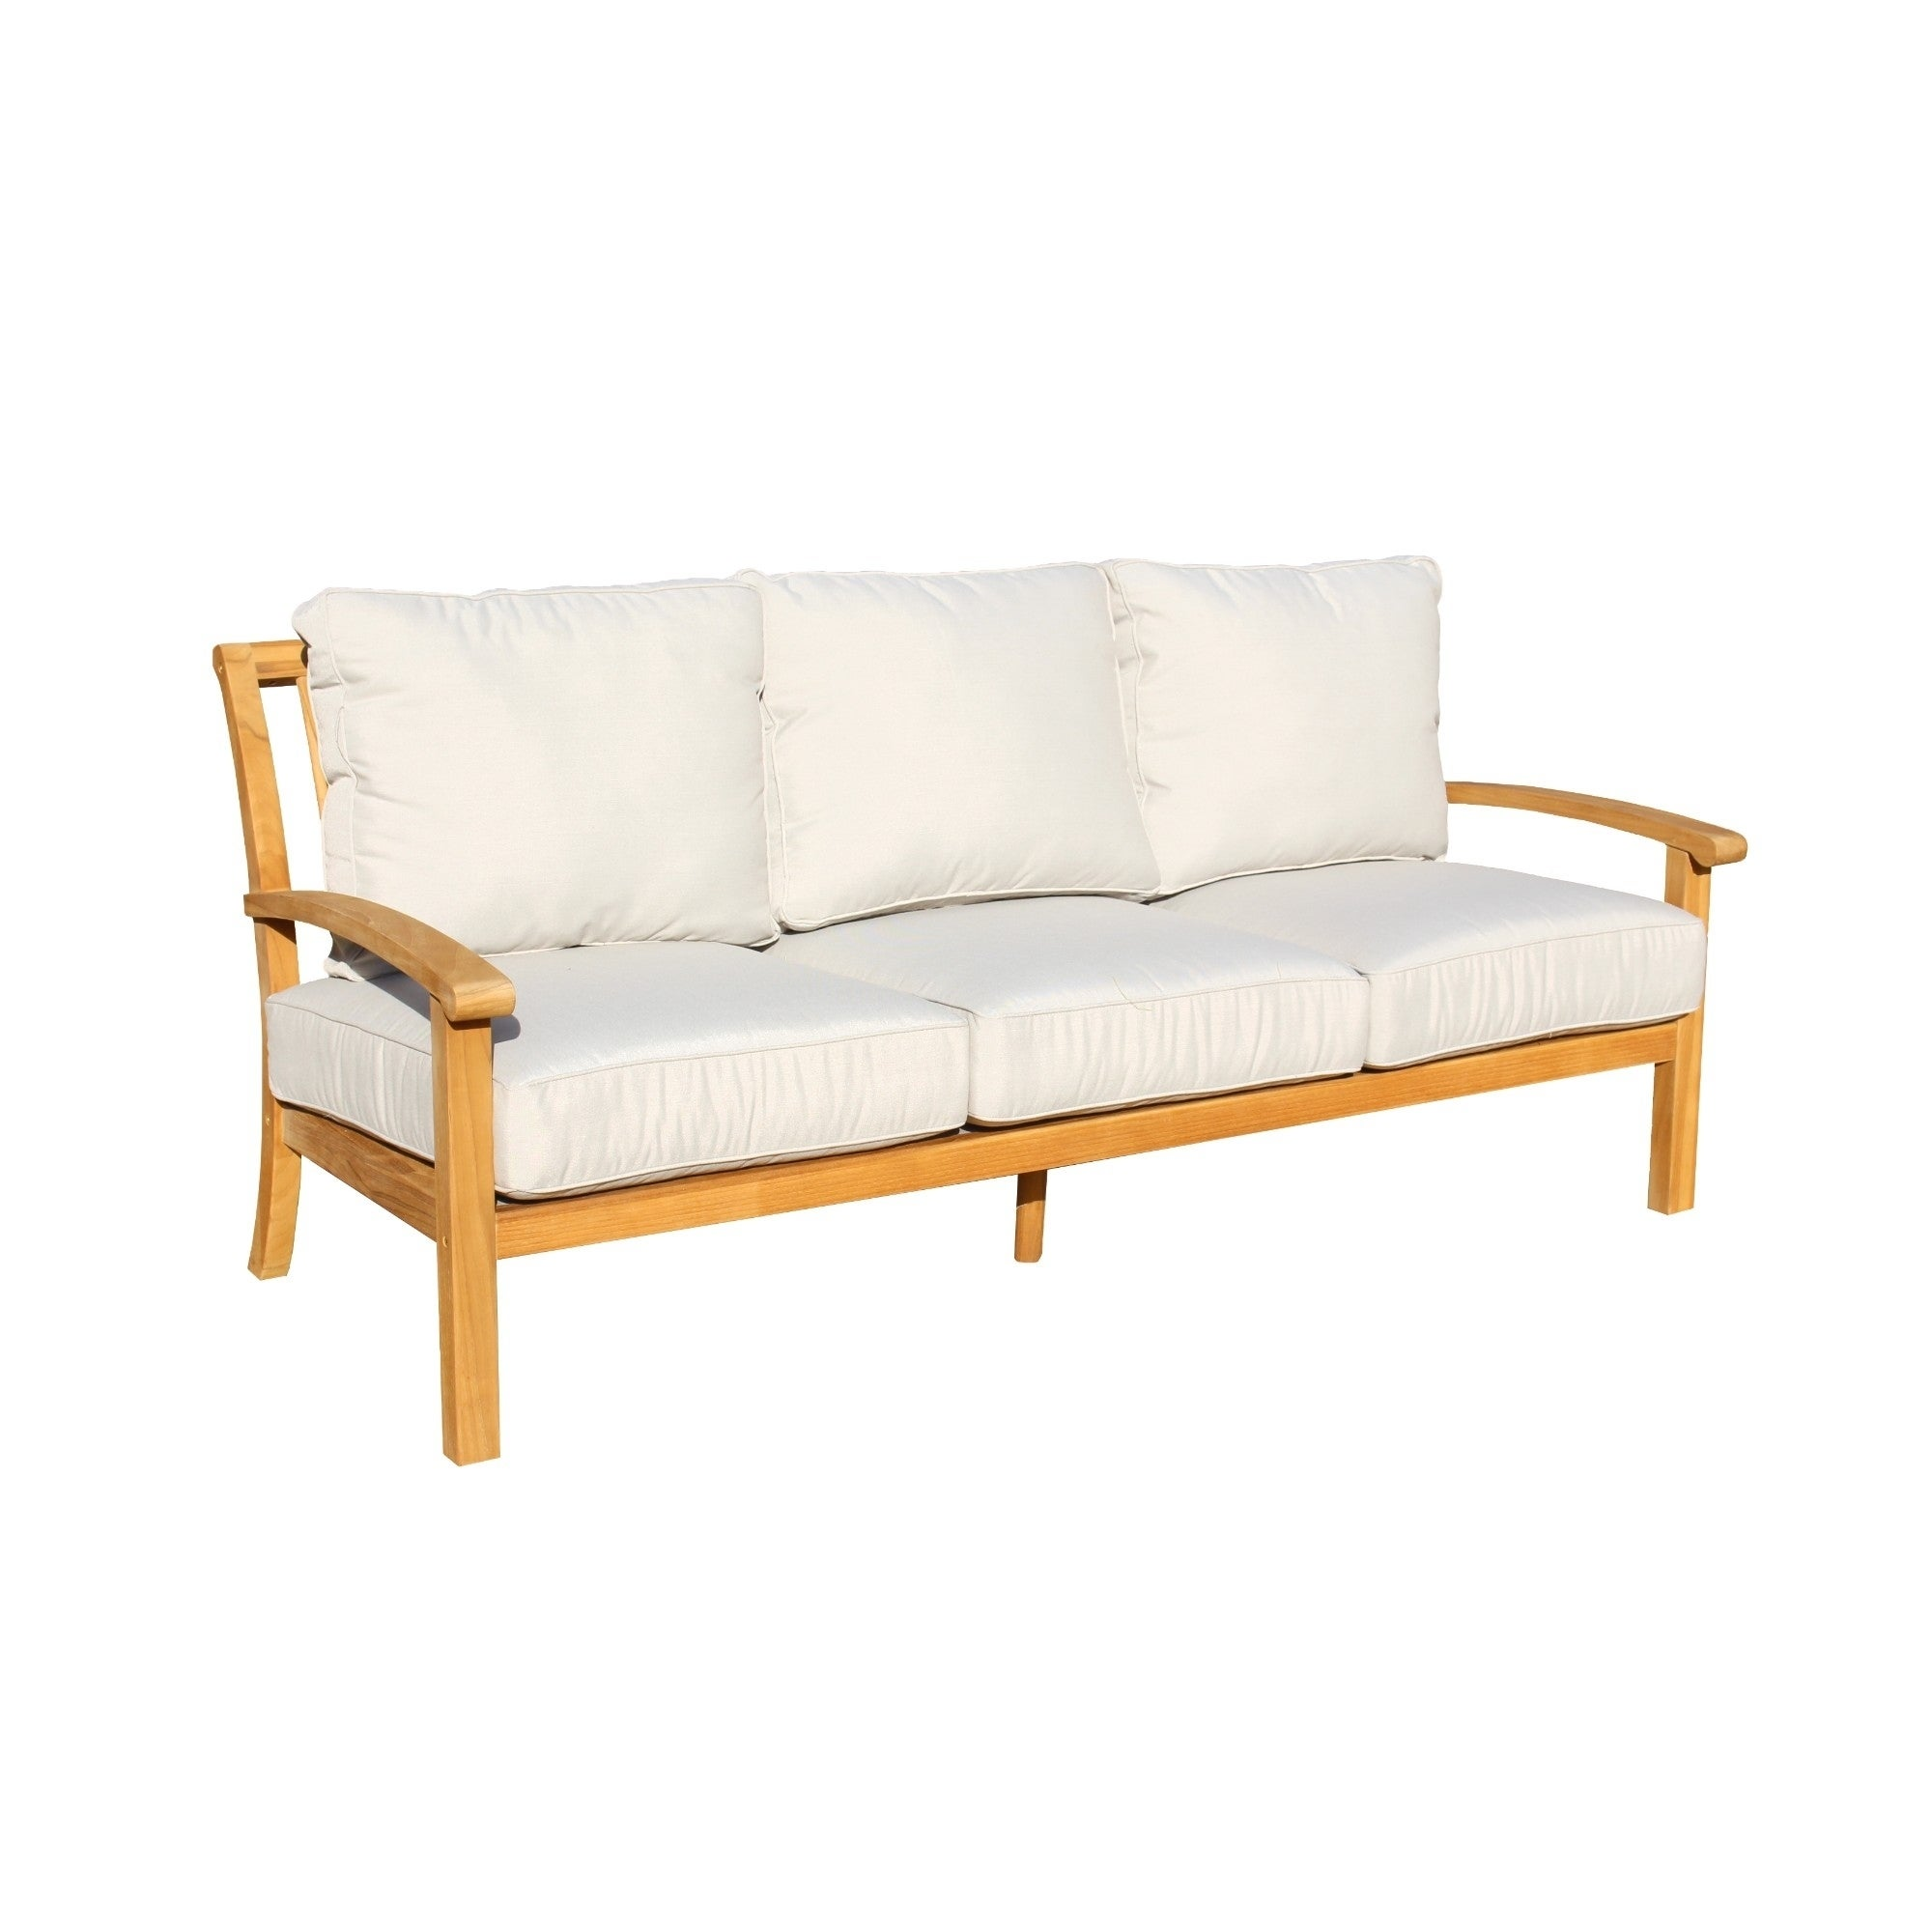 Shop Havenside Home Goodwin Natural Teak Outdoor Sofa - On Sale ...